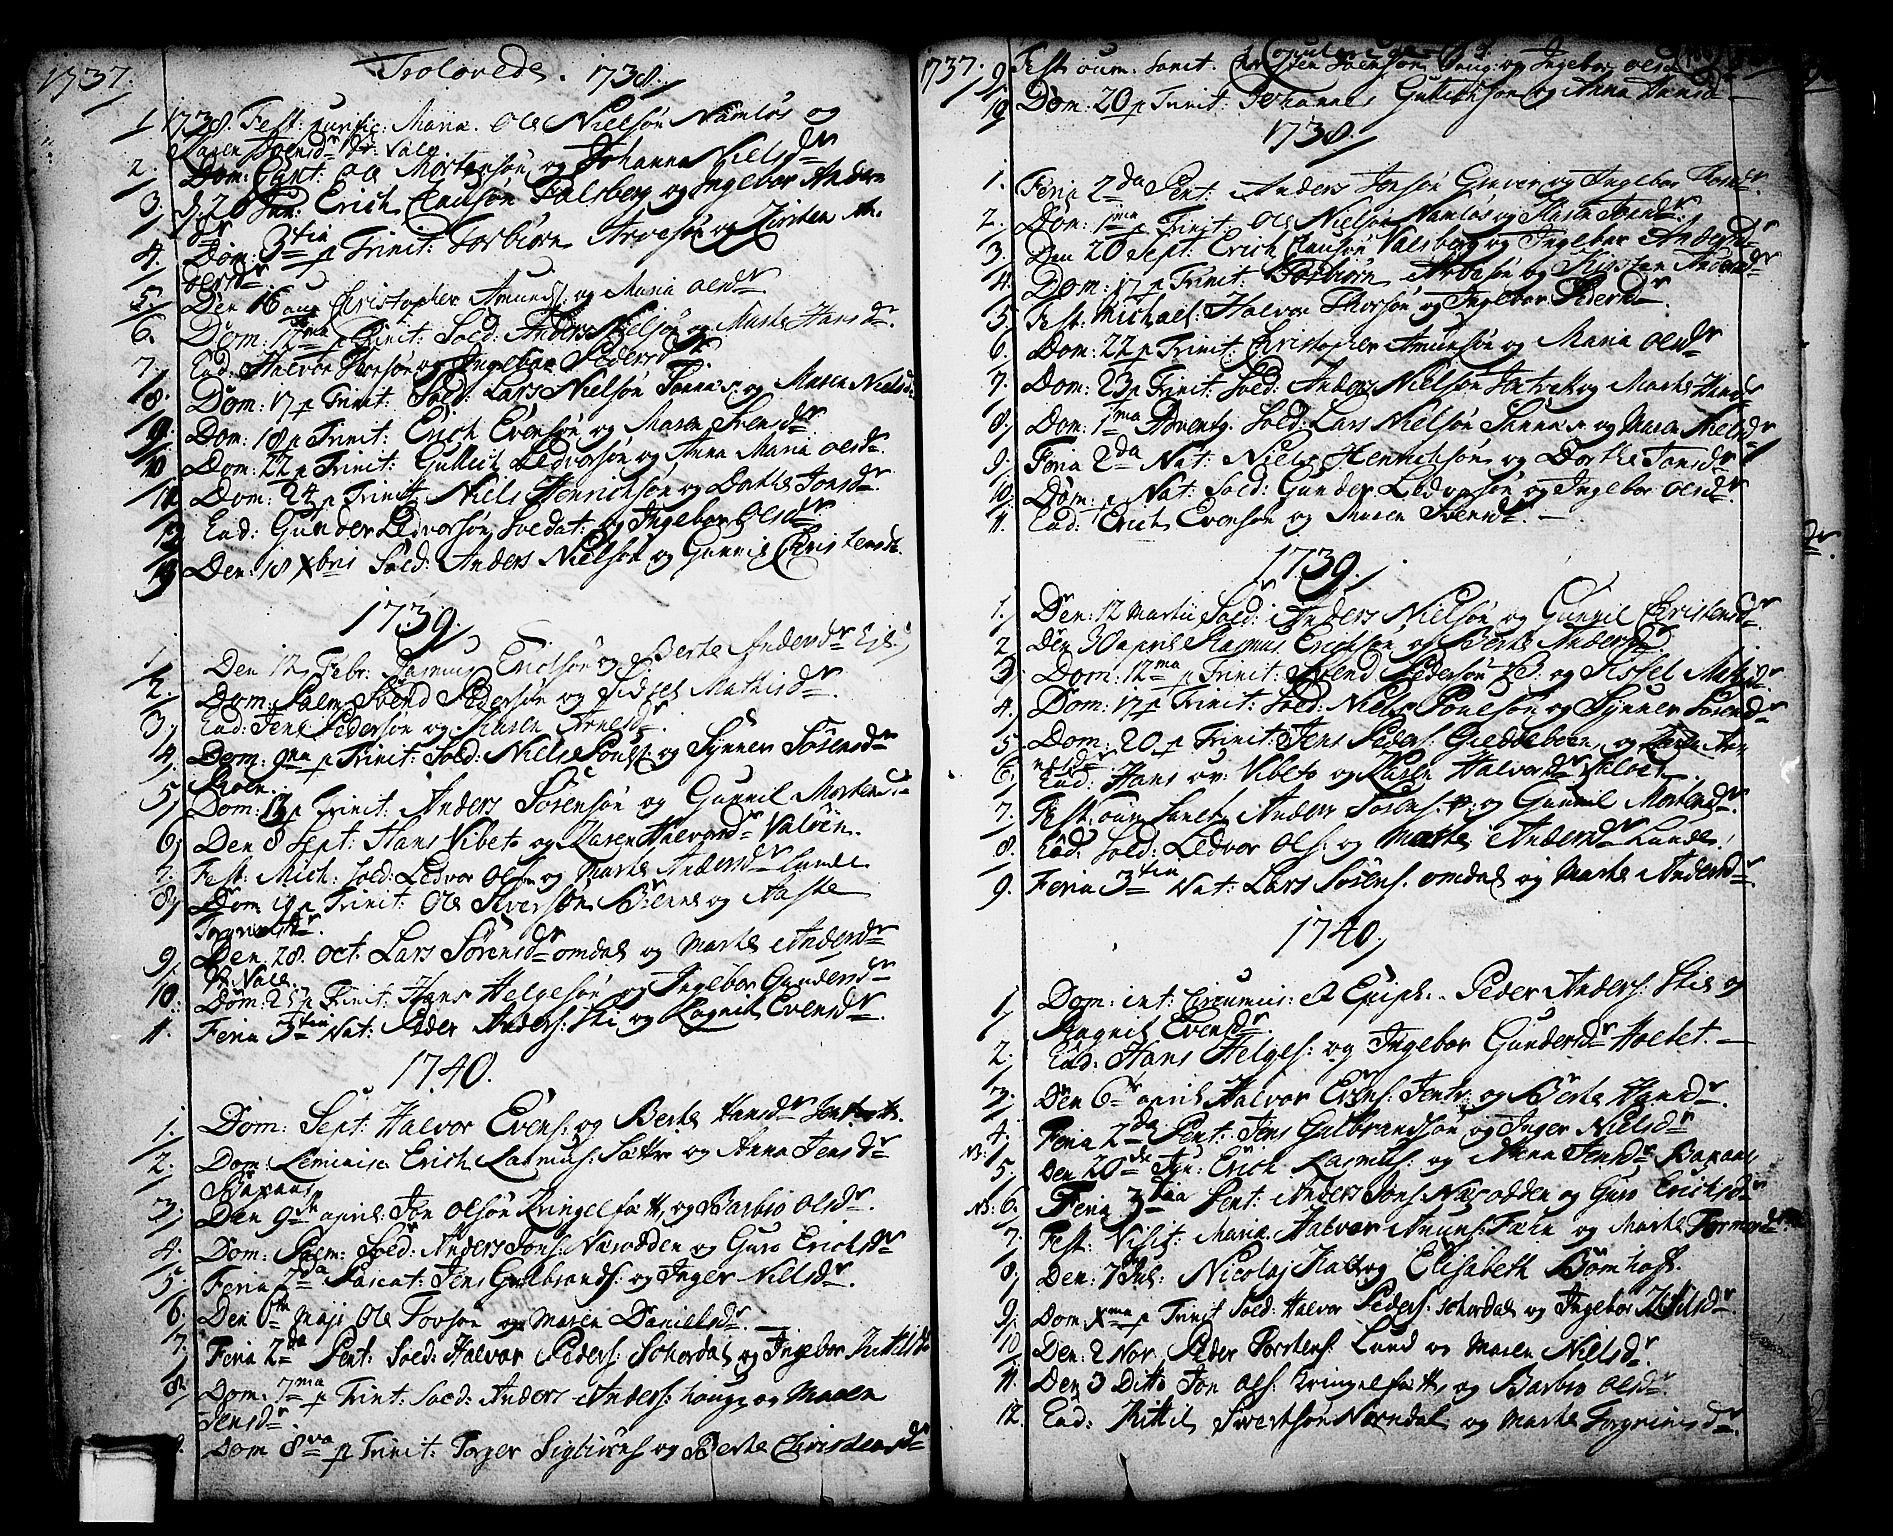 SAKO, Holla kirkebøker, F/Fa/L0001: Ministerialbok nr. 1, 1717-1779, s. 155